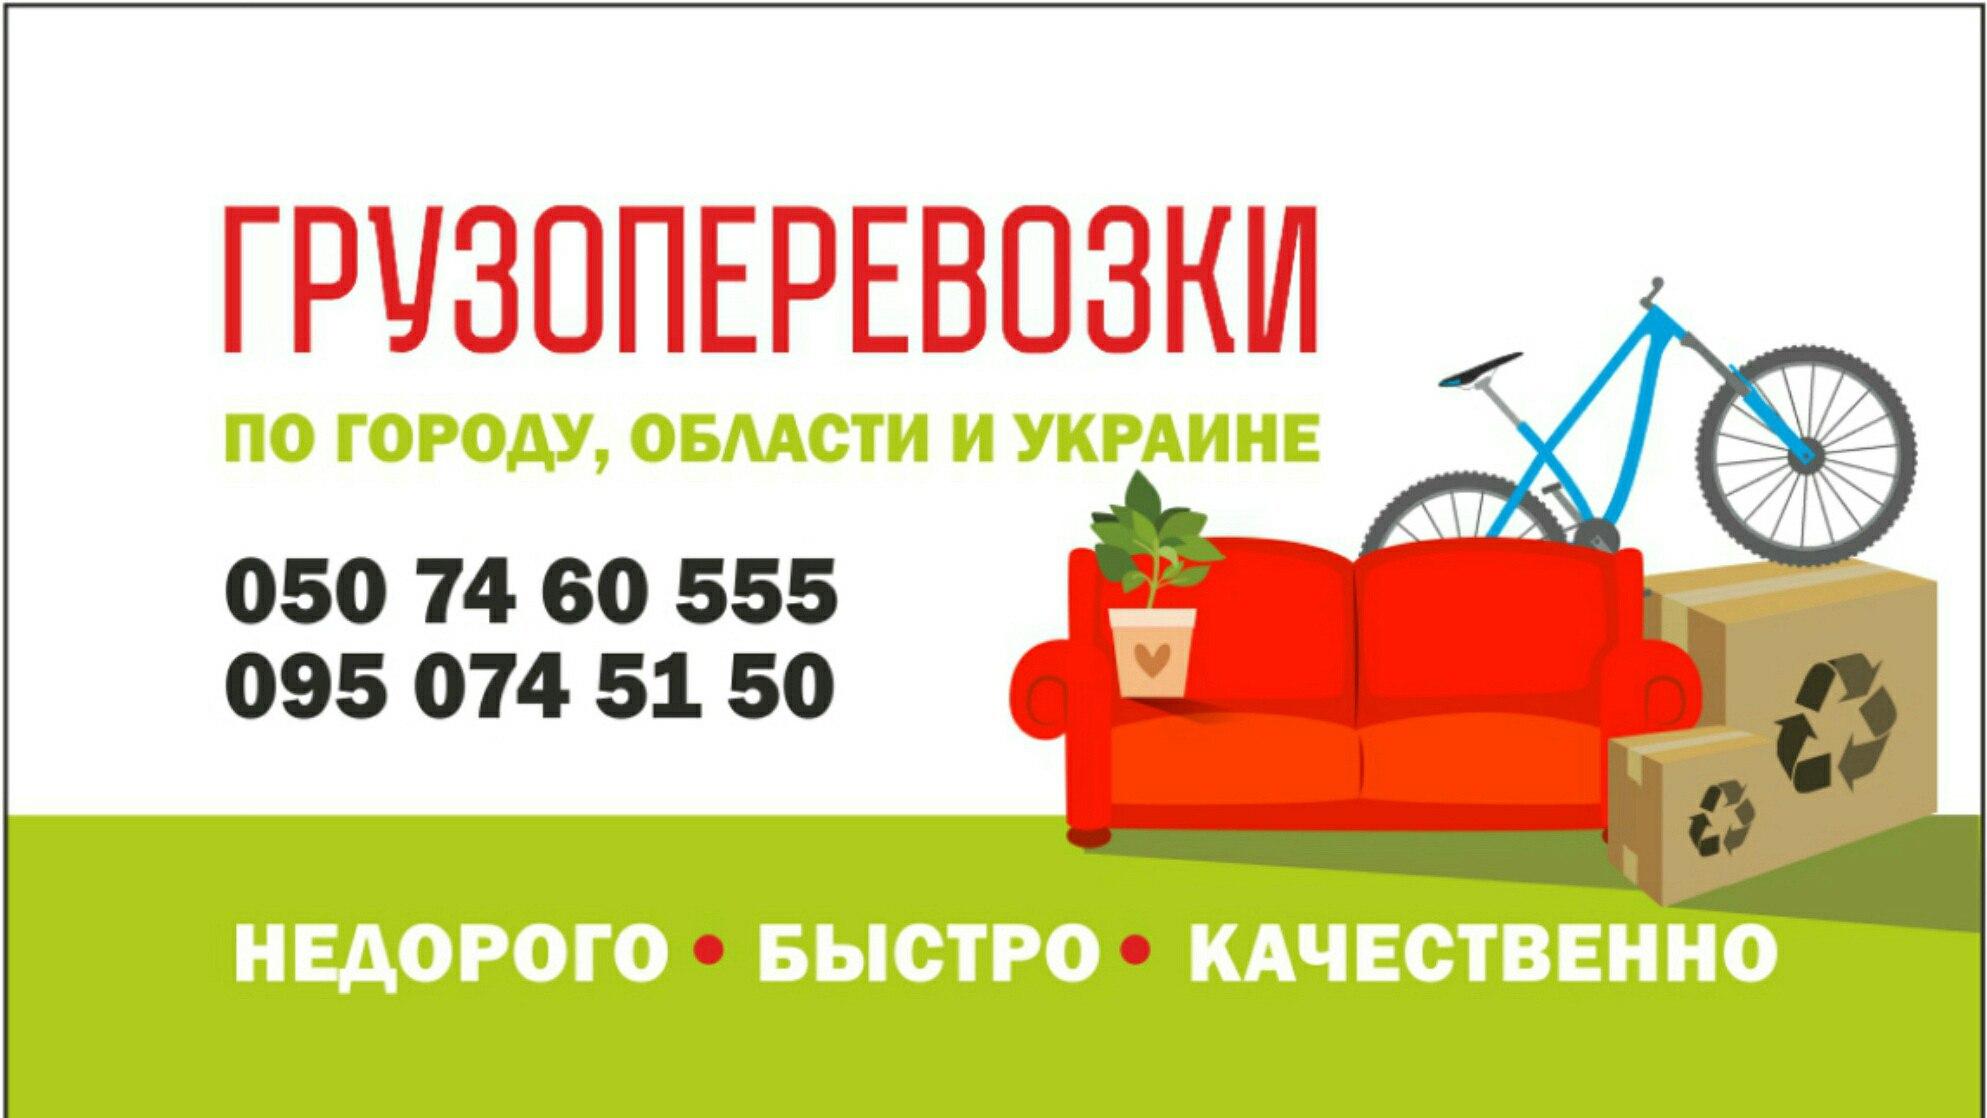 https://pp.vk.me/c636326/v636326181/1de00/A0yp8qxNOnM.jpg